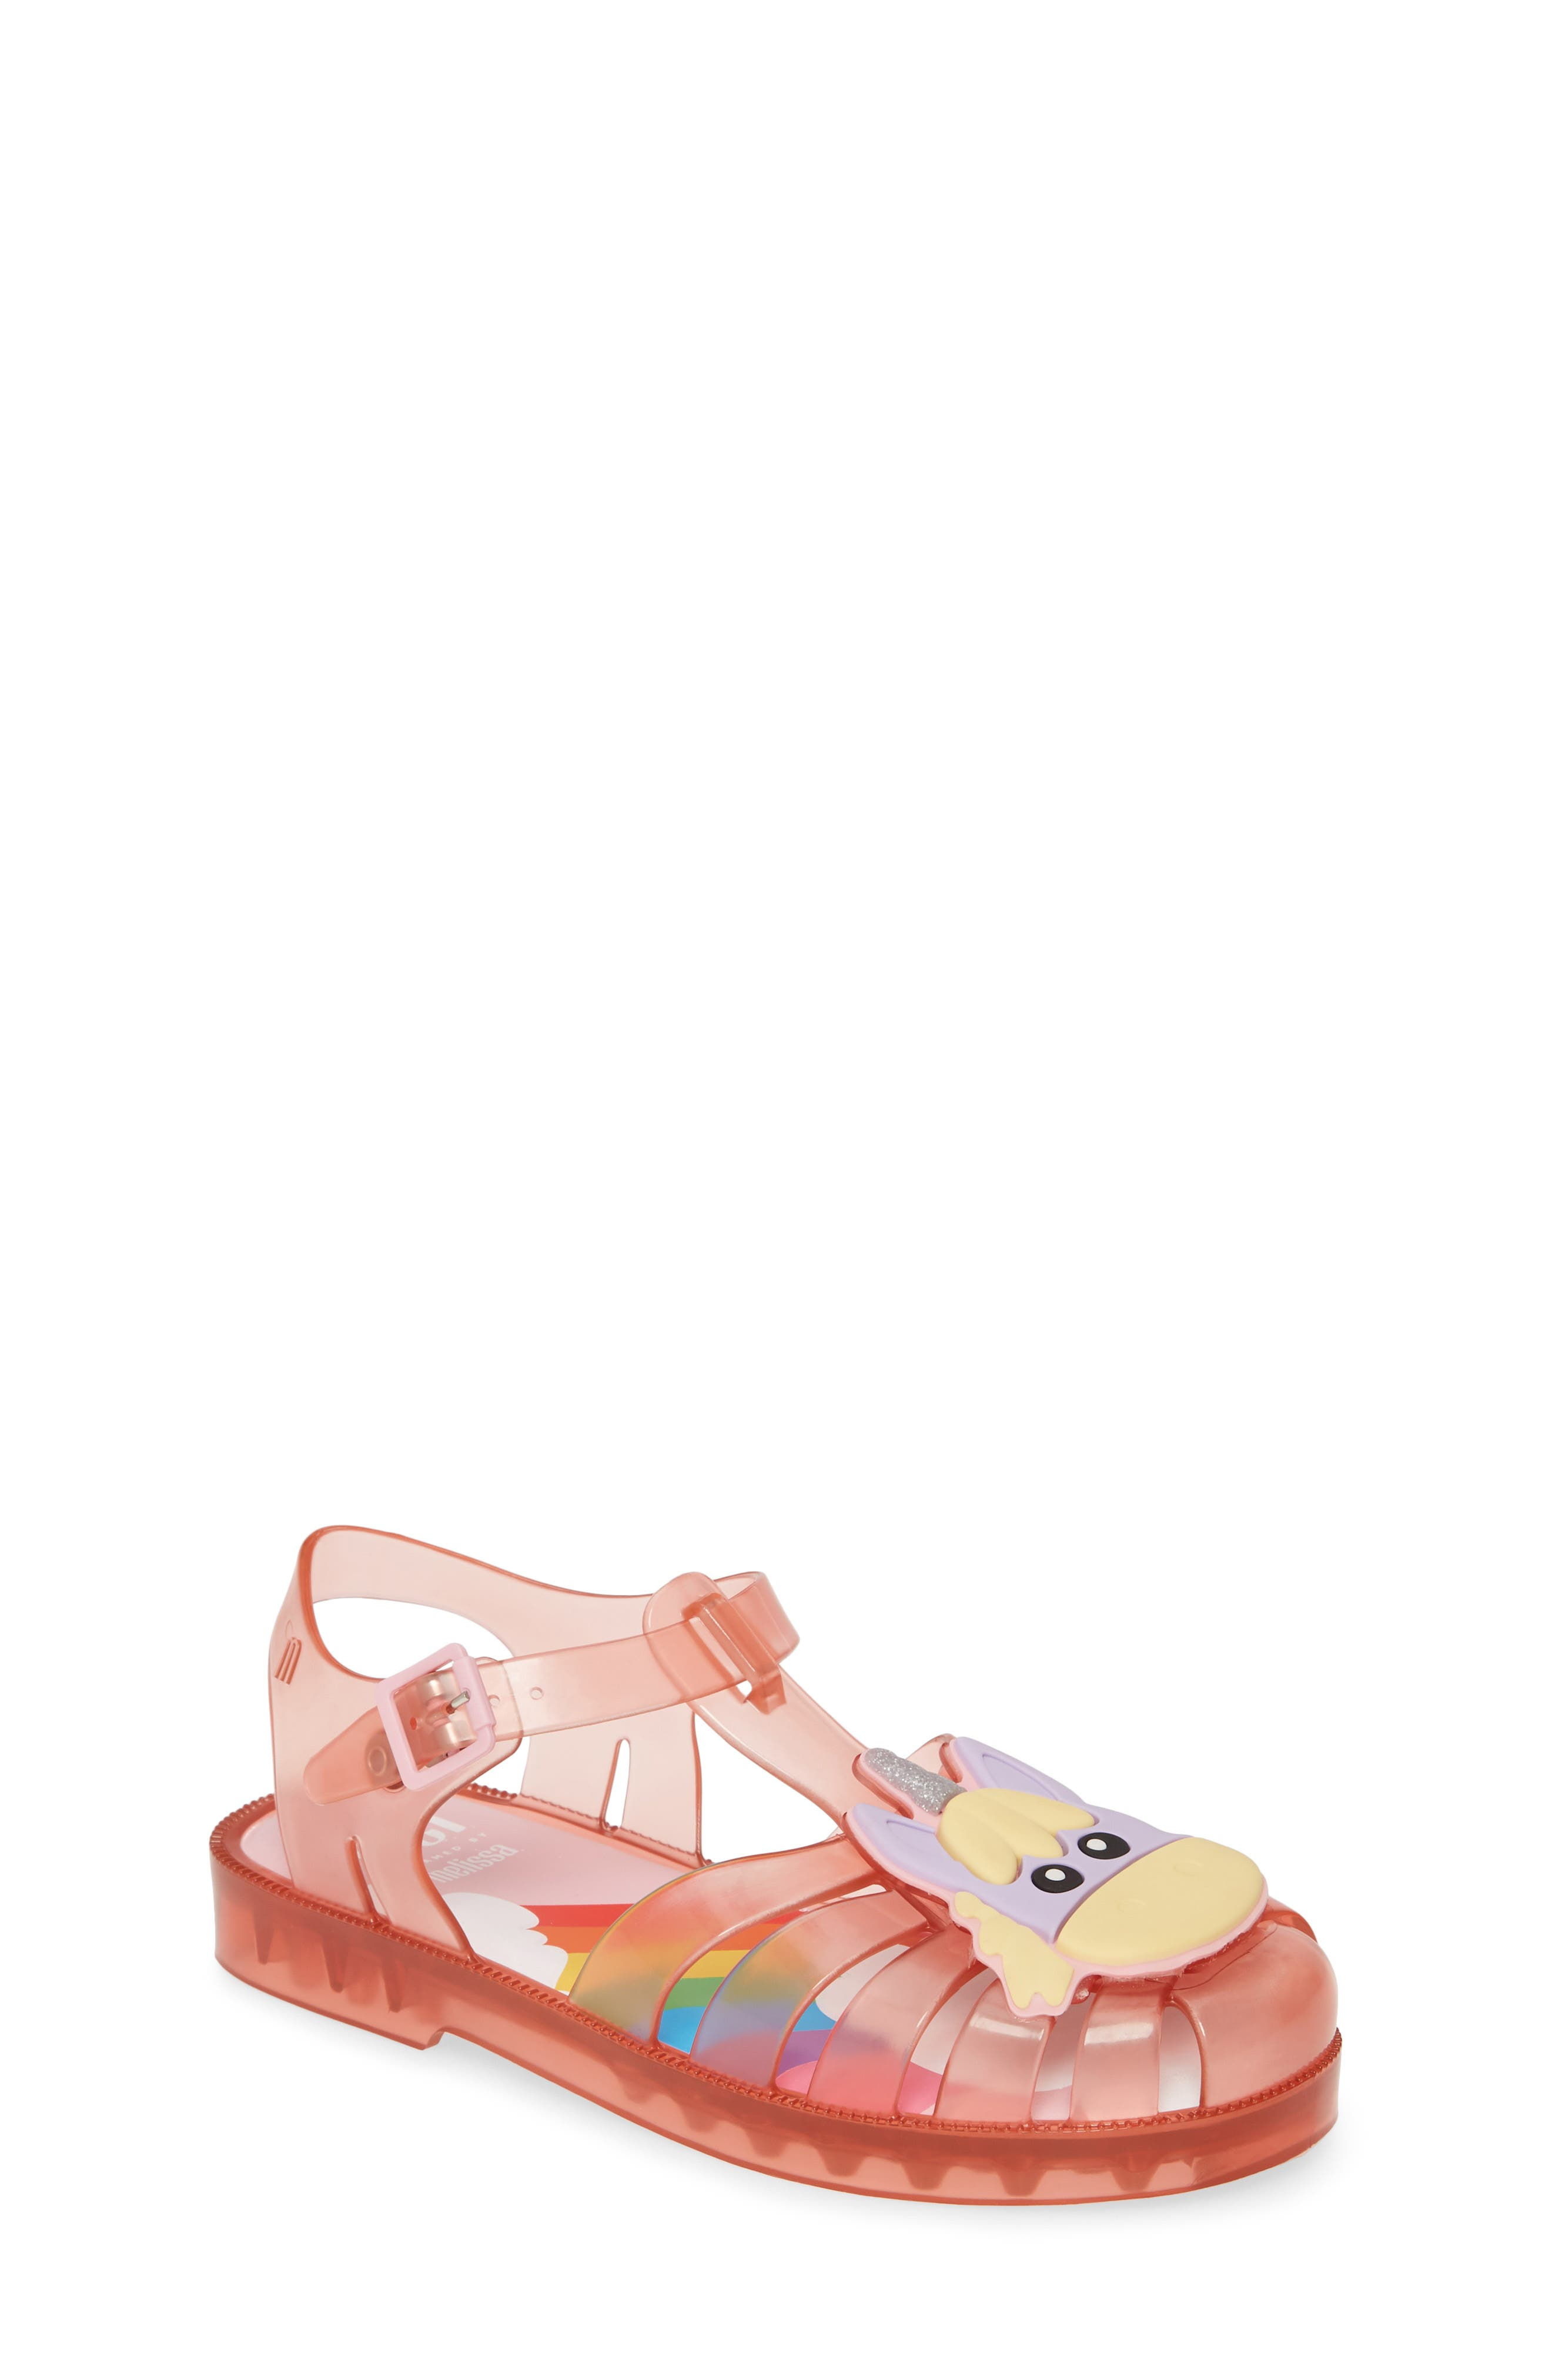 Toddler Girls Mel By Melissa Possession Unicorn Glitter Sandal Size 12 M  Pink